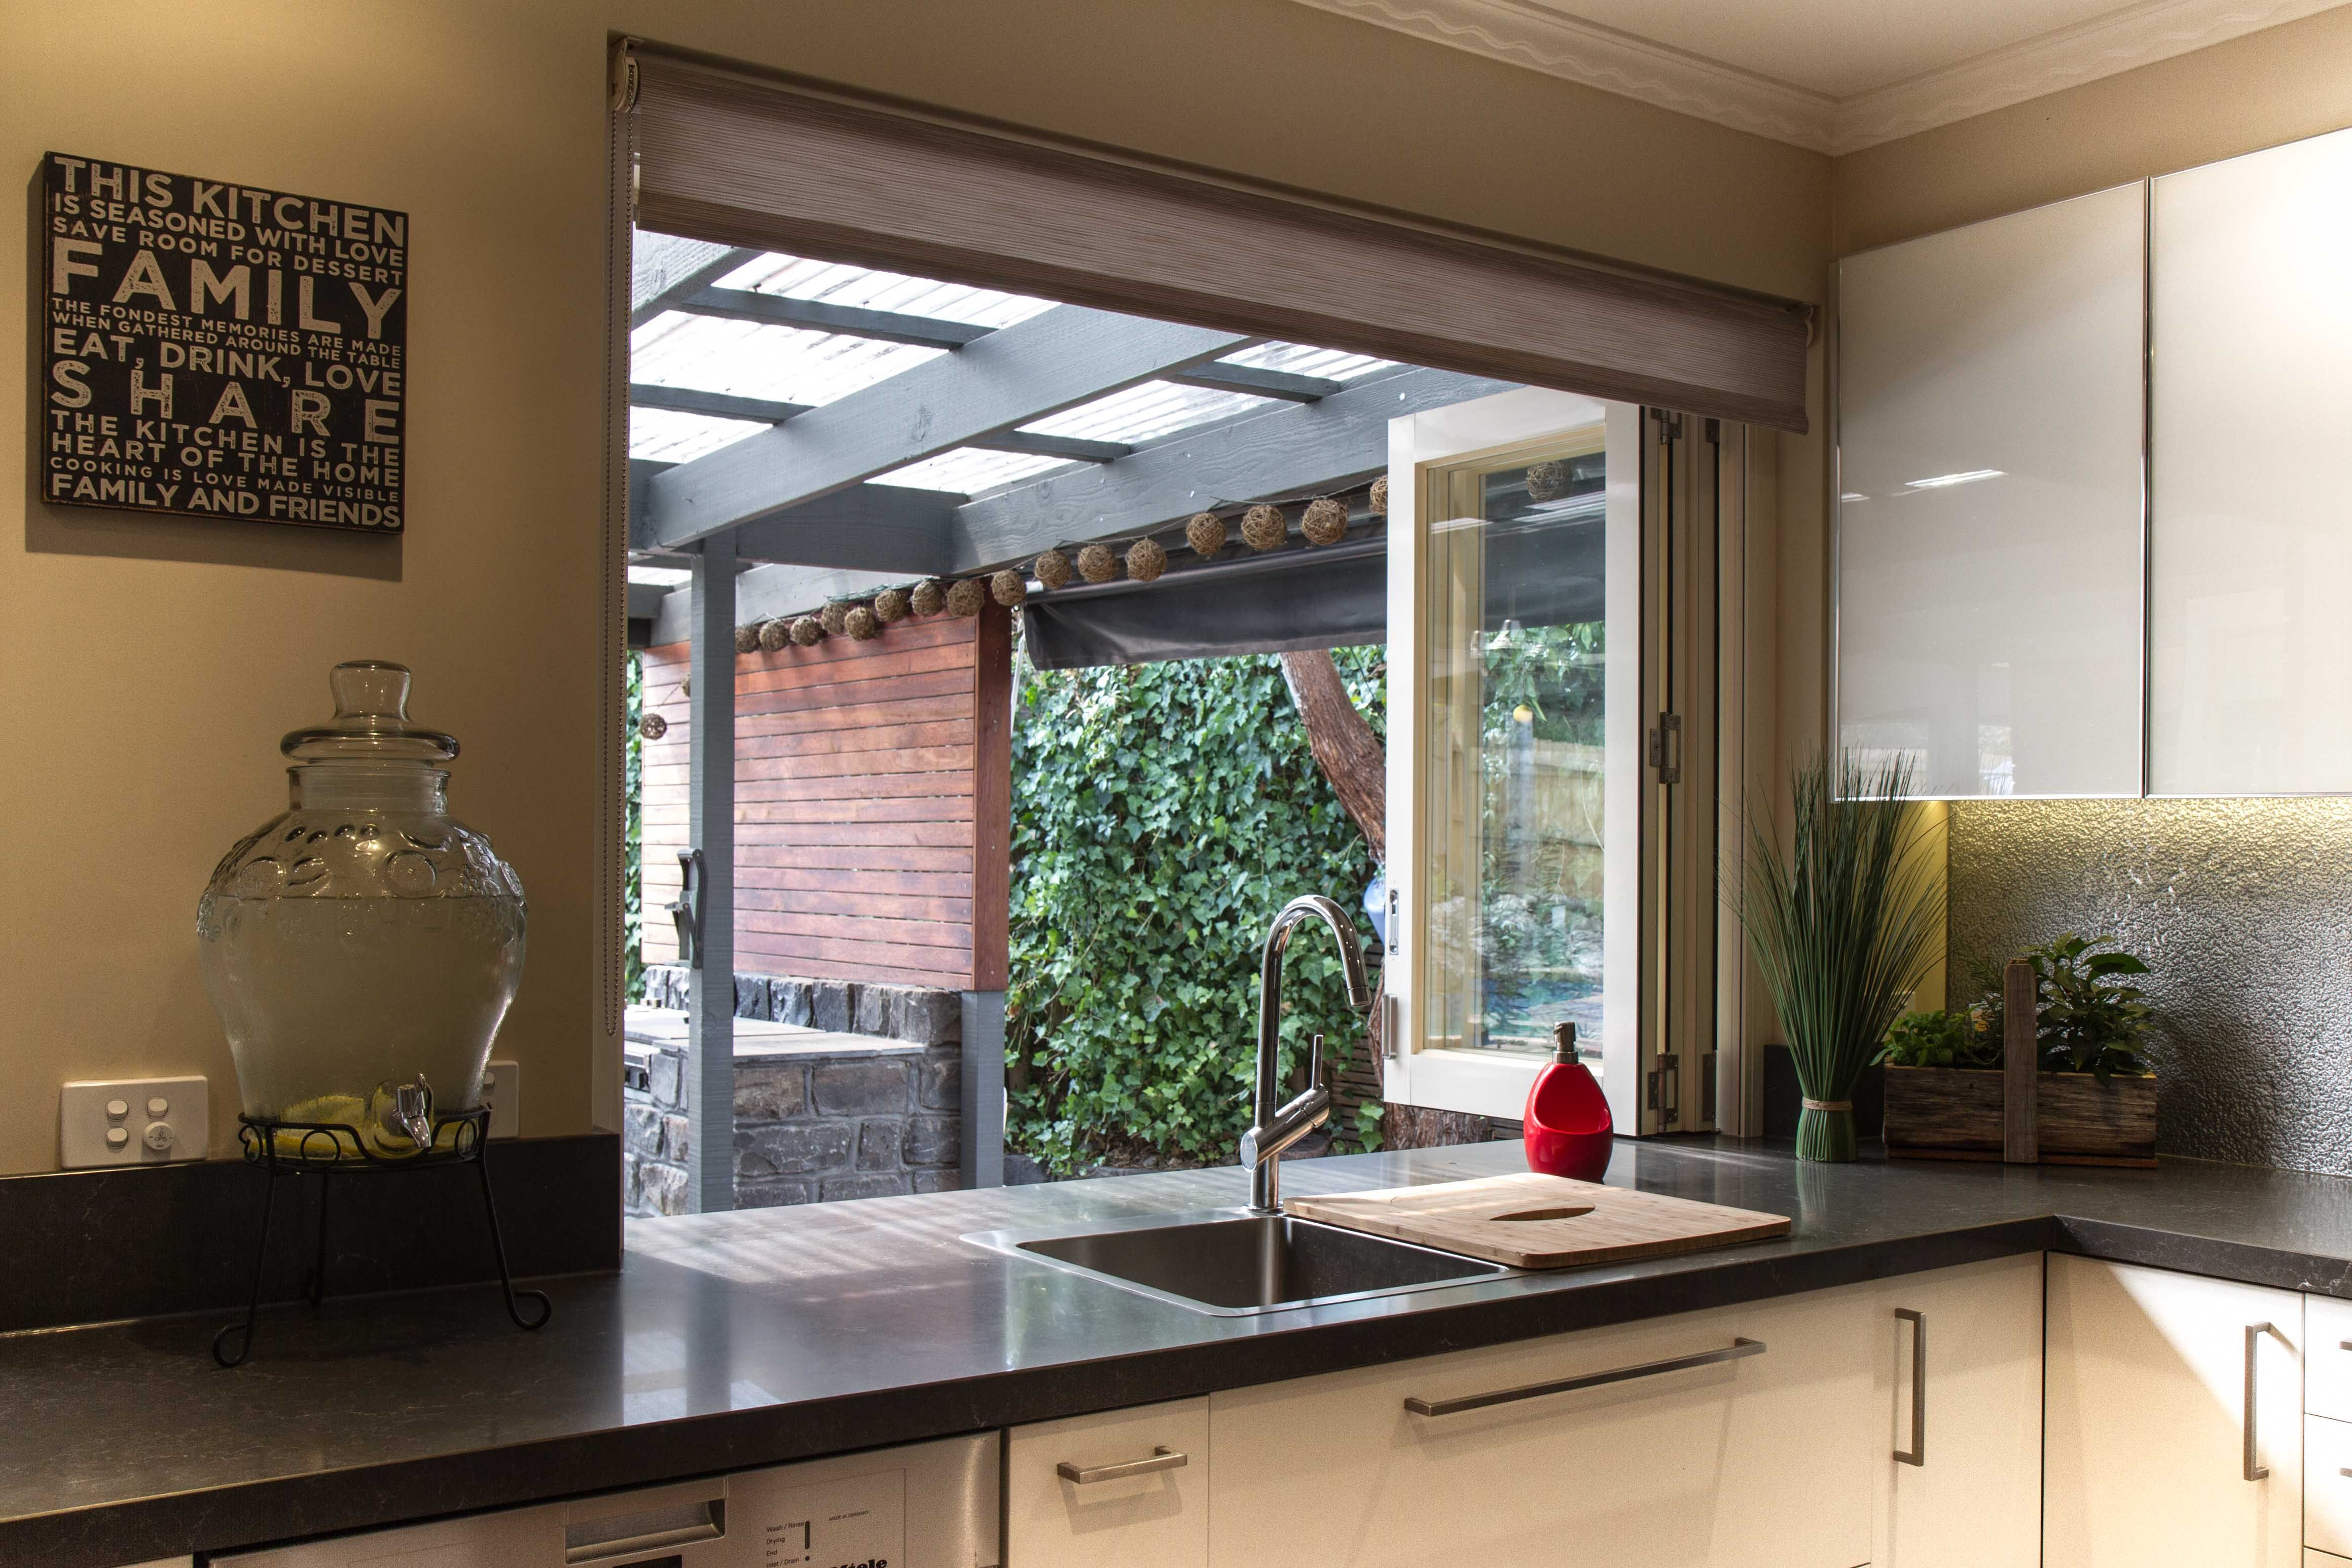 Modern kitchen. Servery window. Fold up windows at sink